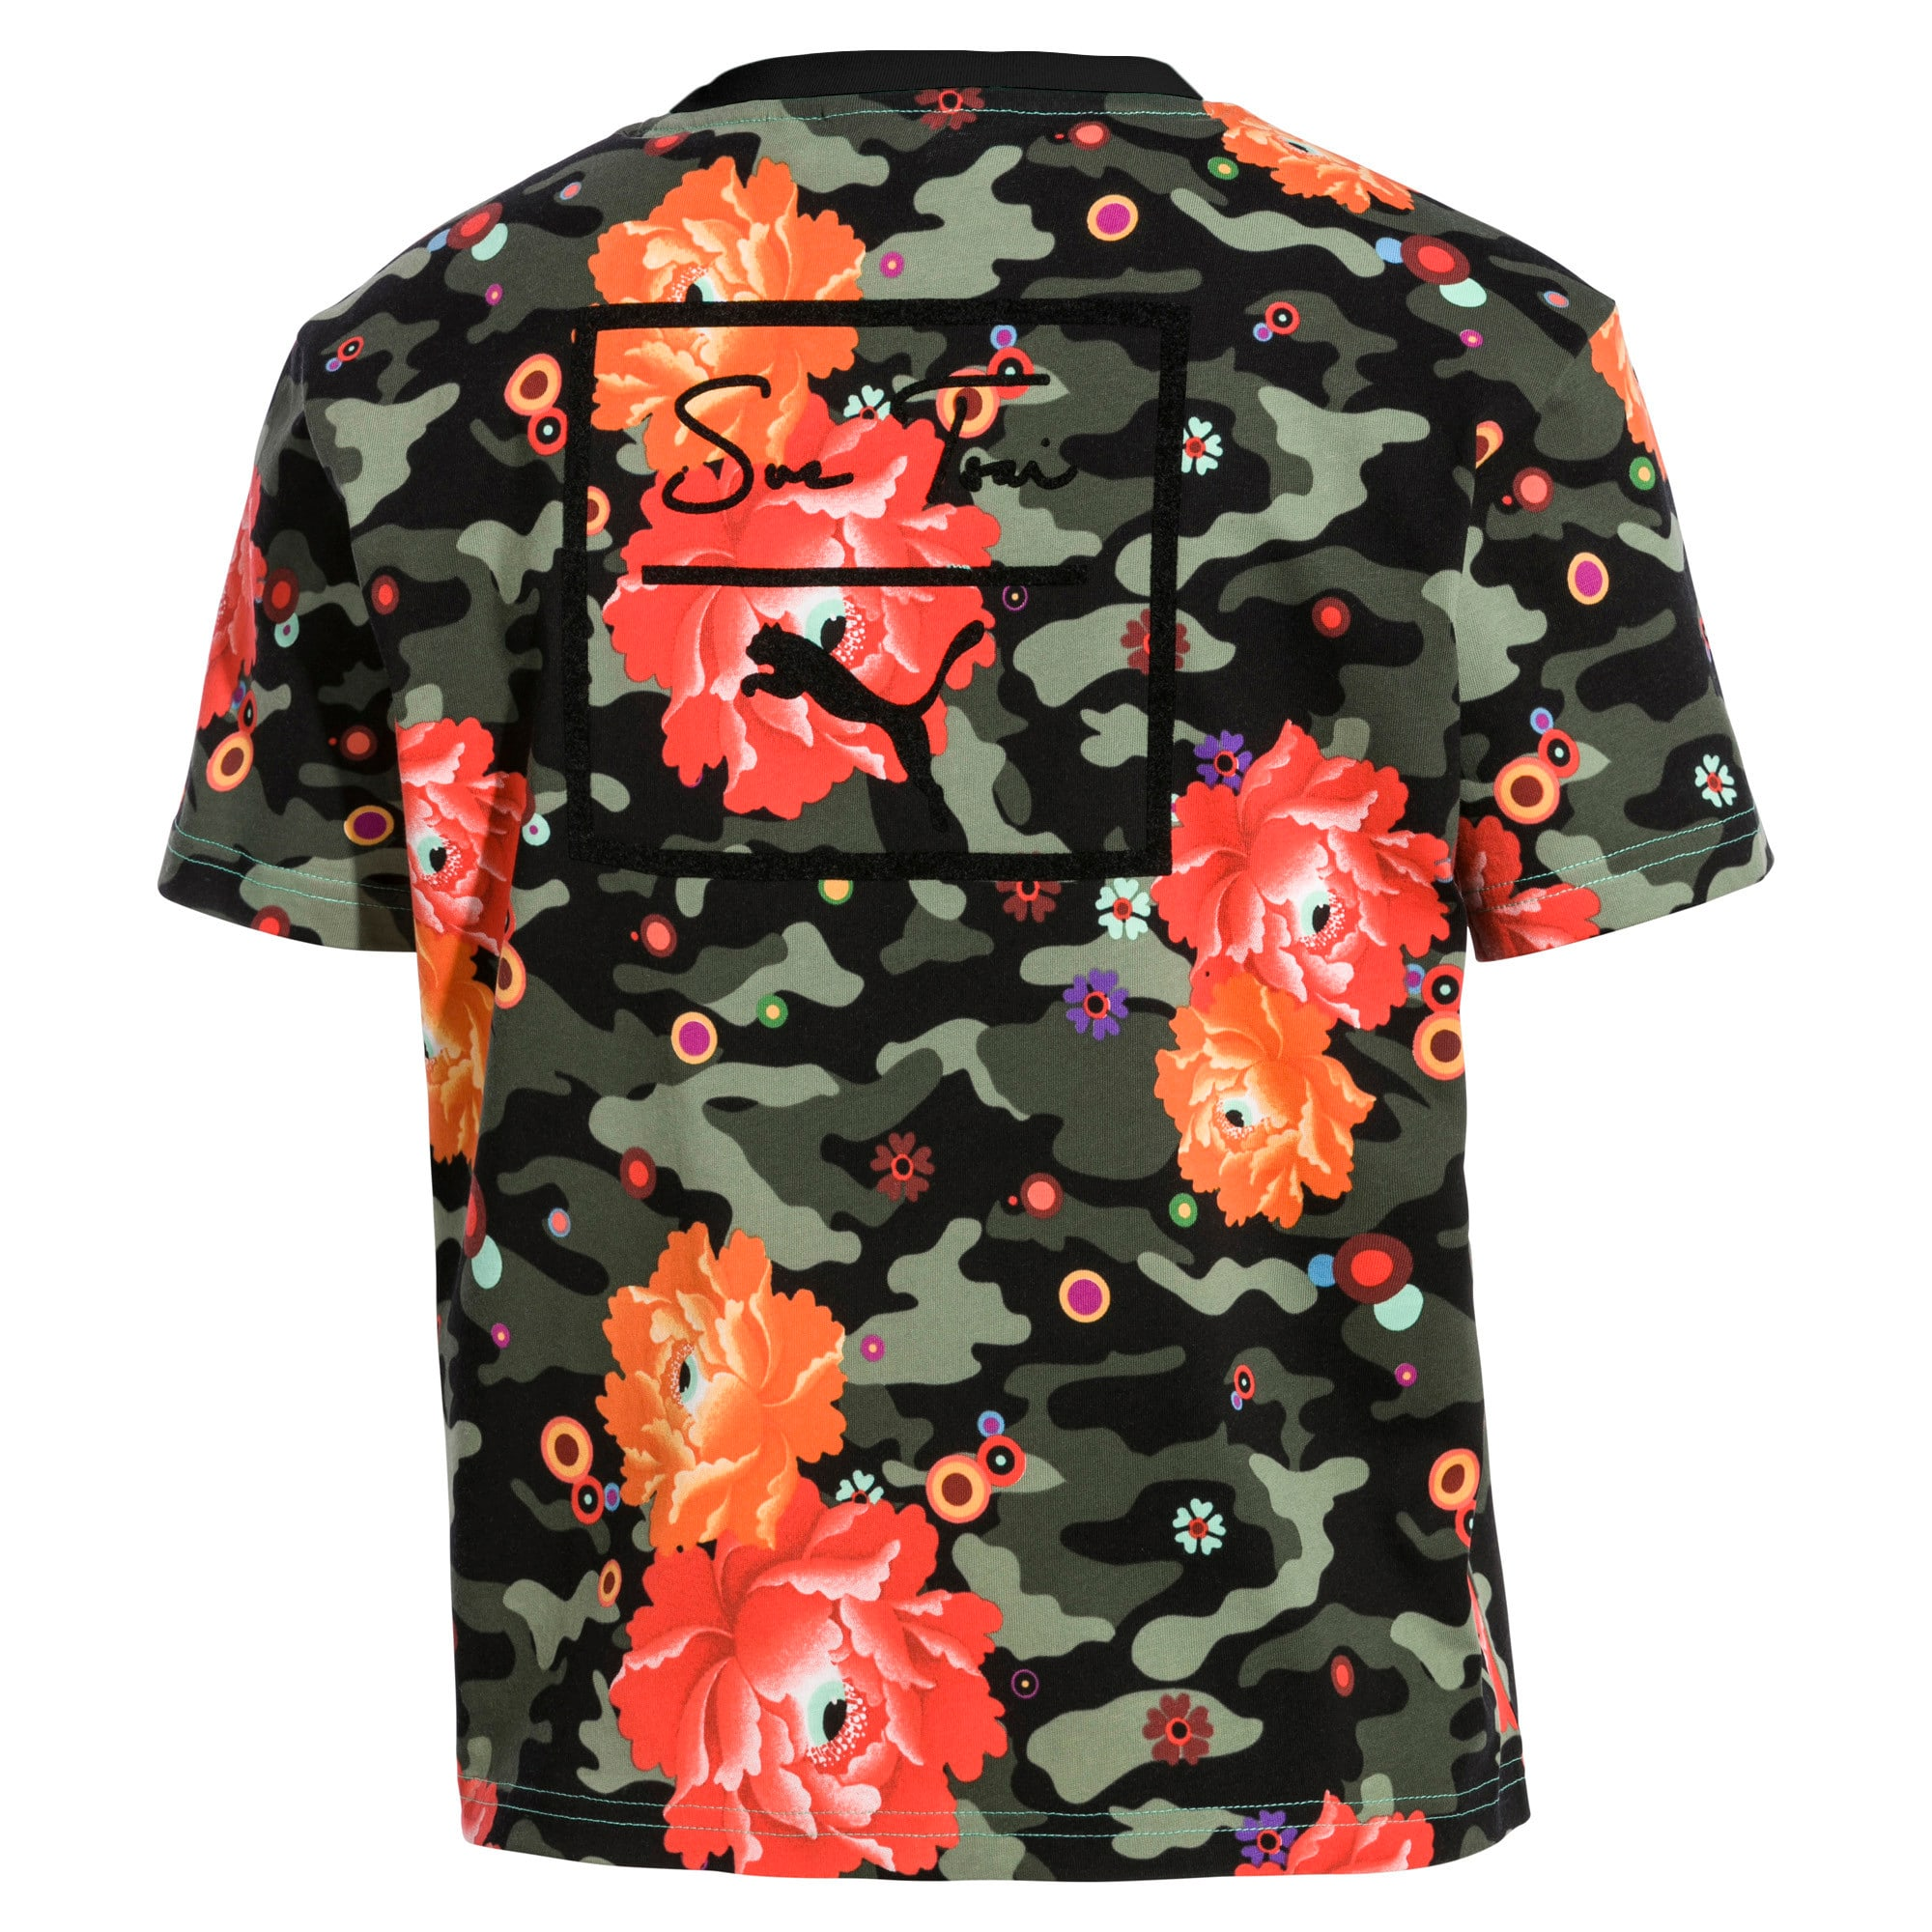 Thumbnail 4 of PUMA x SUE TSAI ウィメンズ  Tシャツ, Puma Black- Peony, medium-JPN